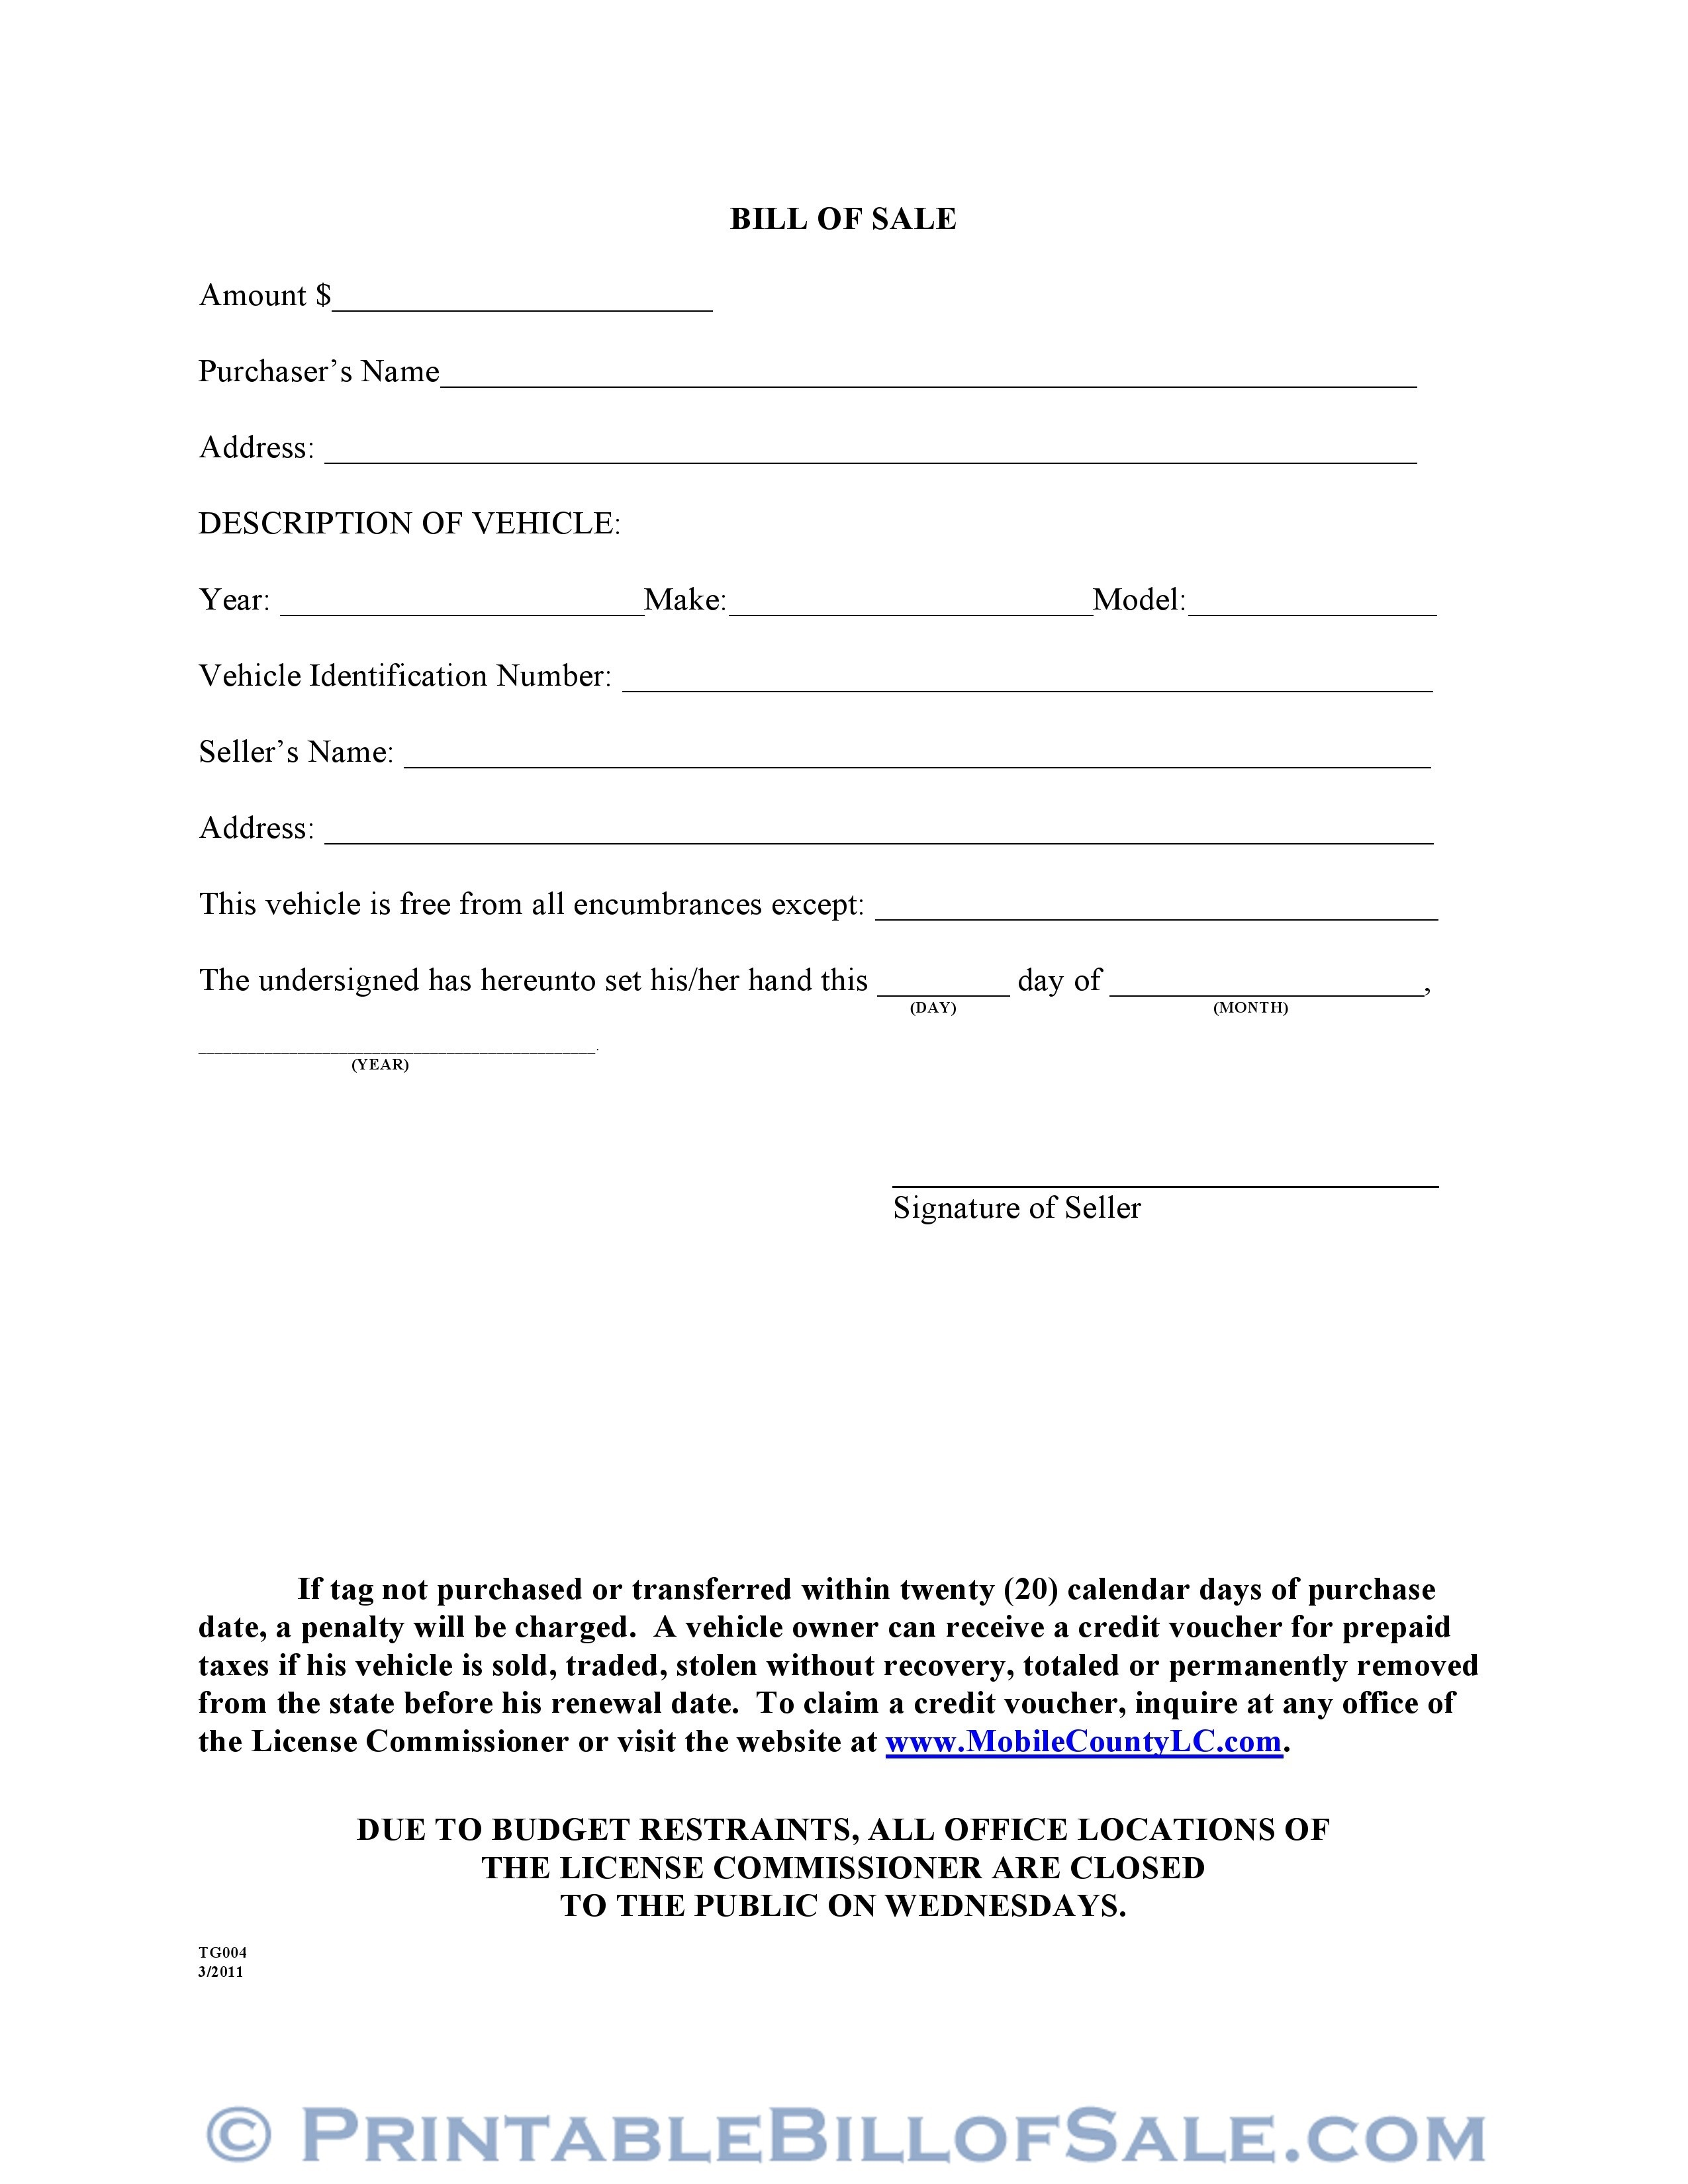 006 Magnificent Printable Bill Of Sale Template Inspiration  Word Saskatchewan Free Used Car OntarioFull